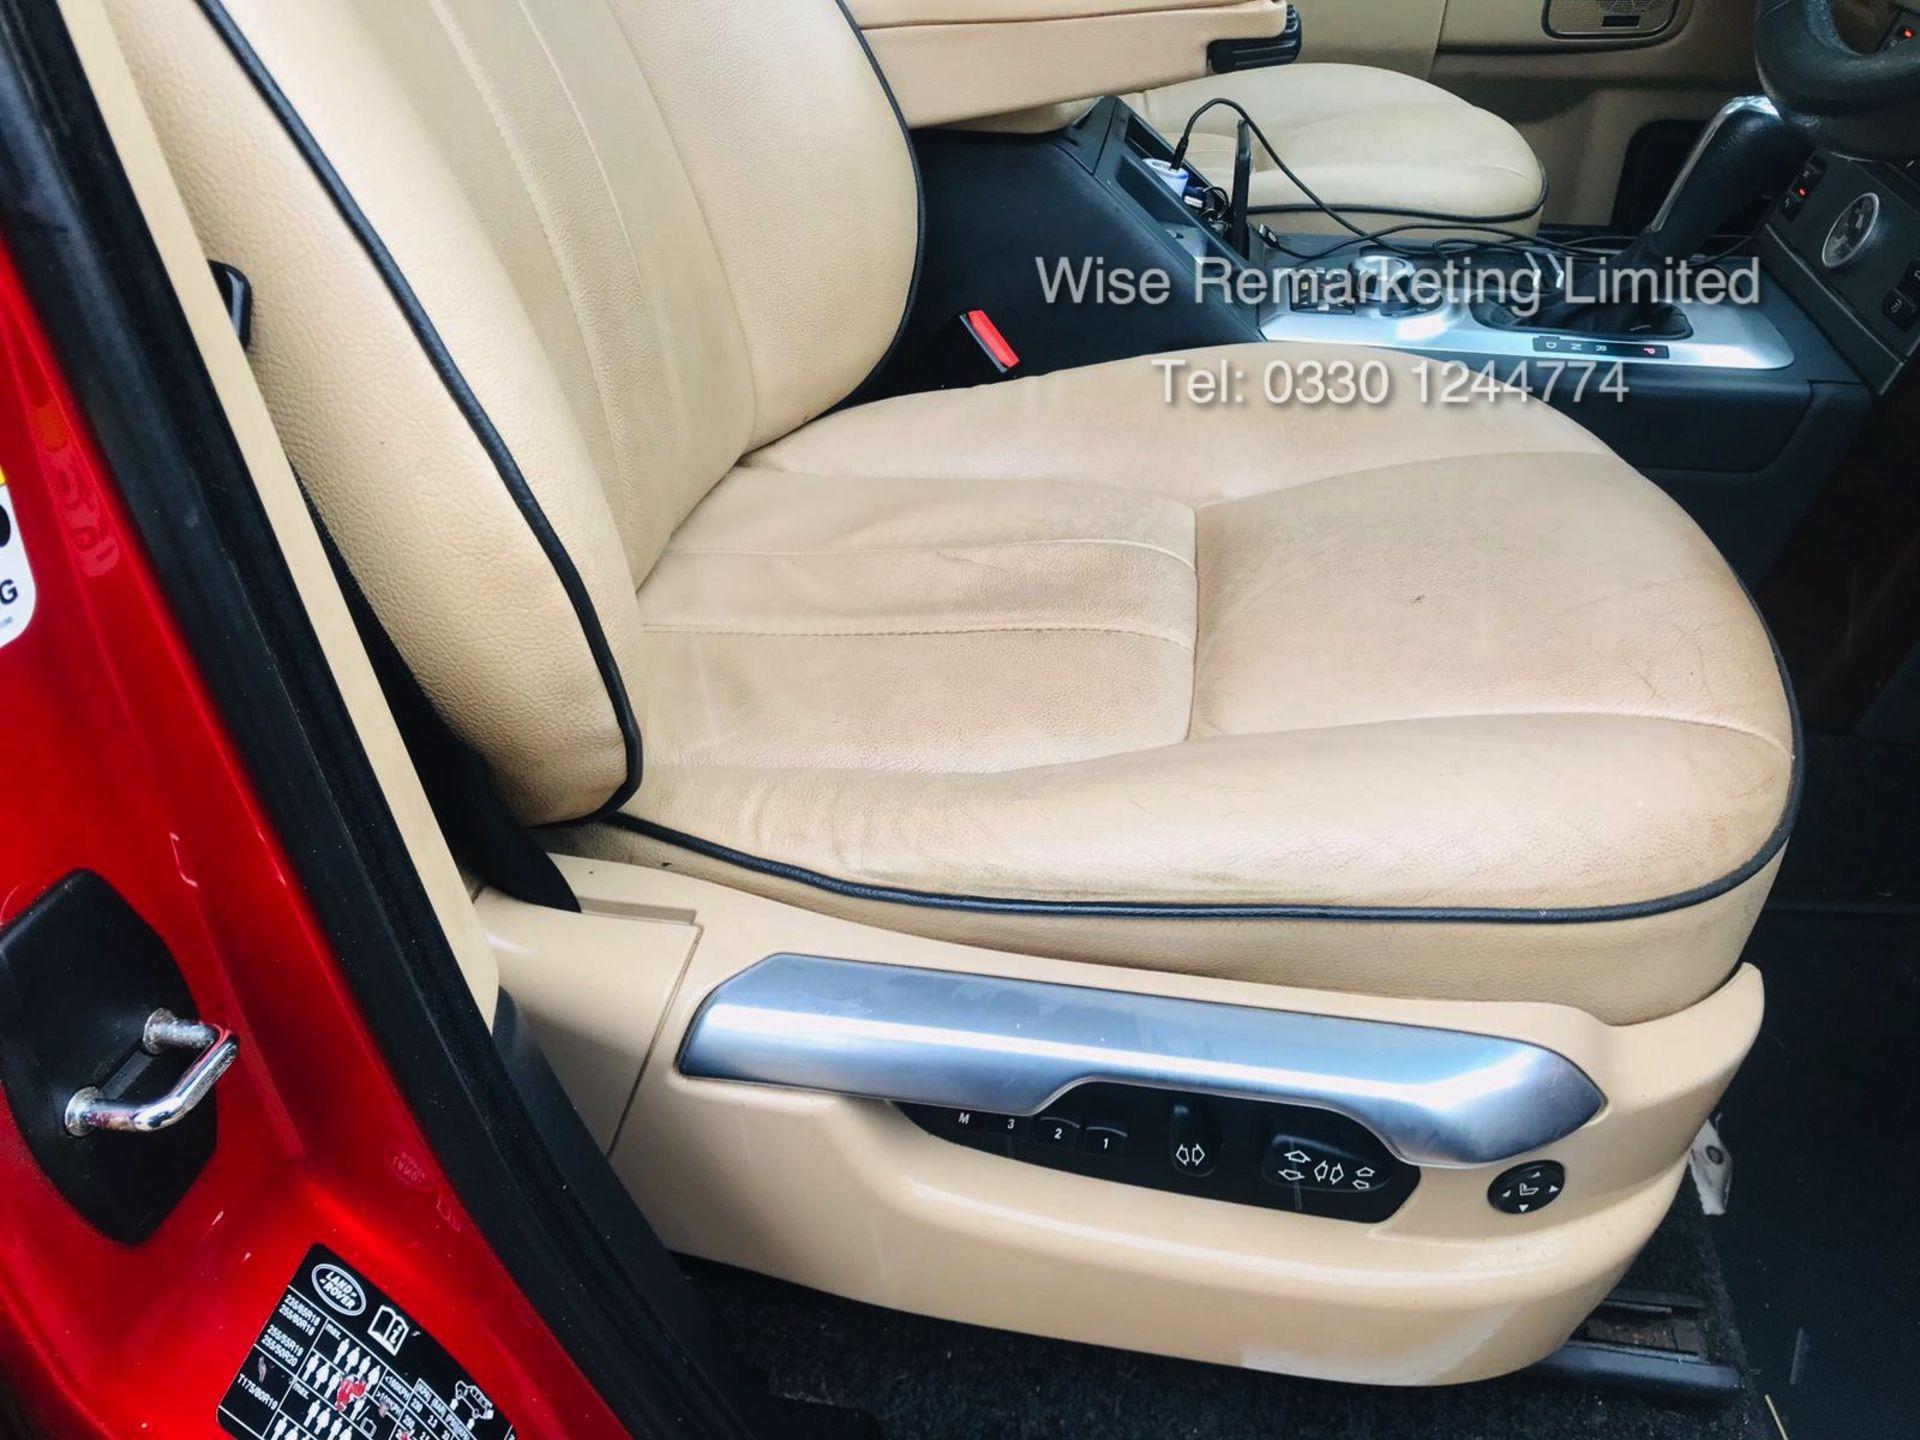 Lot 18 - Range Rover Vogue 3.6 TDV8 HSE Auto - 2010 Model - Cream Leather - Service History -